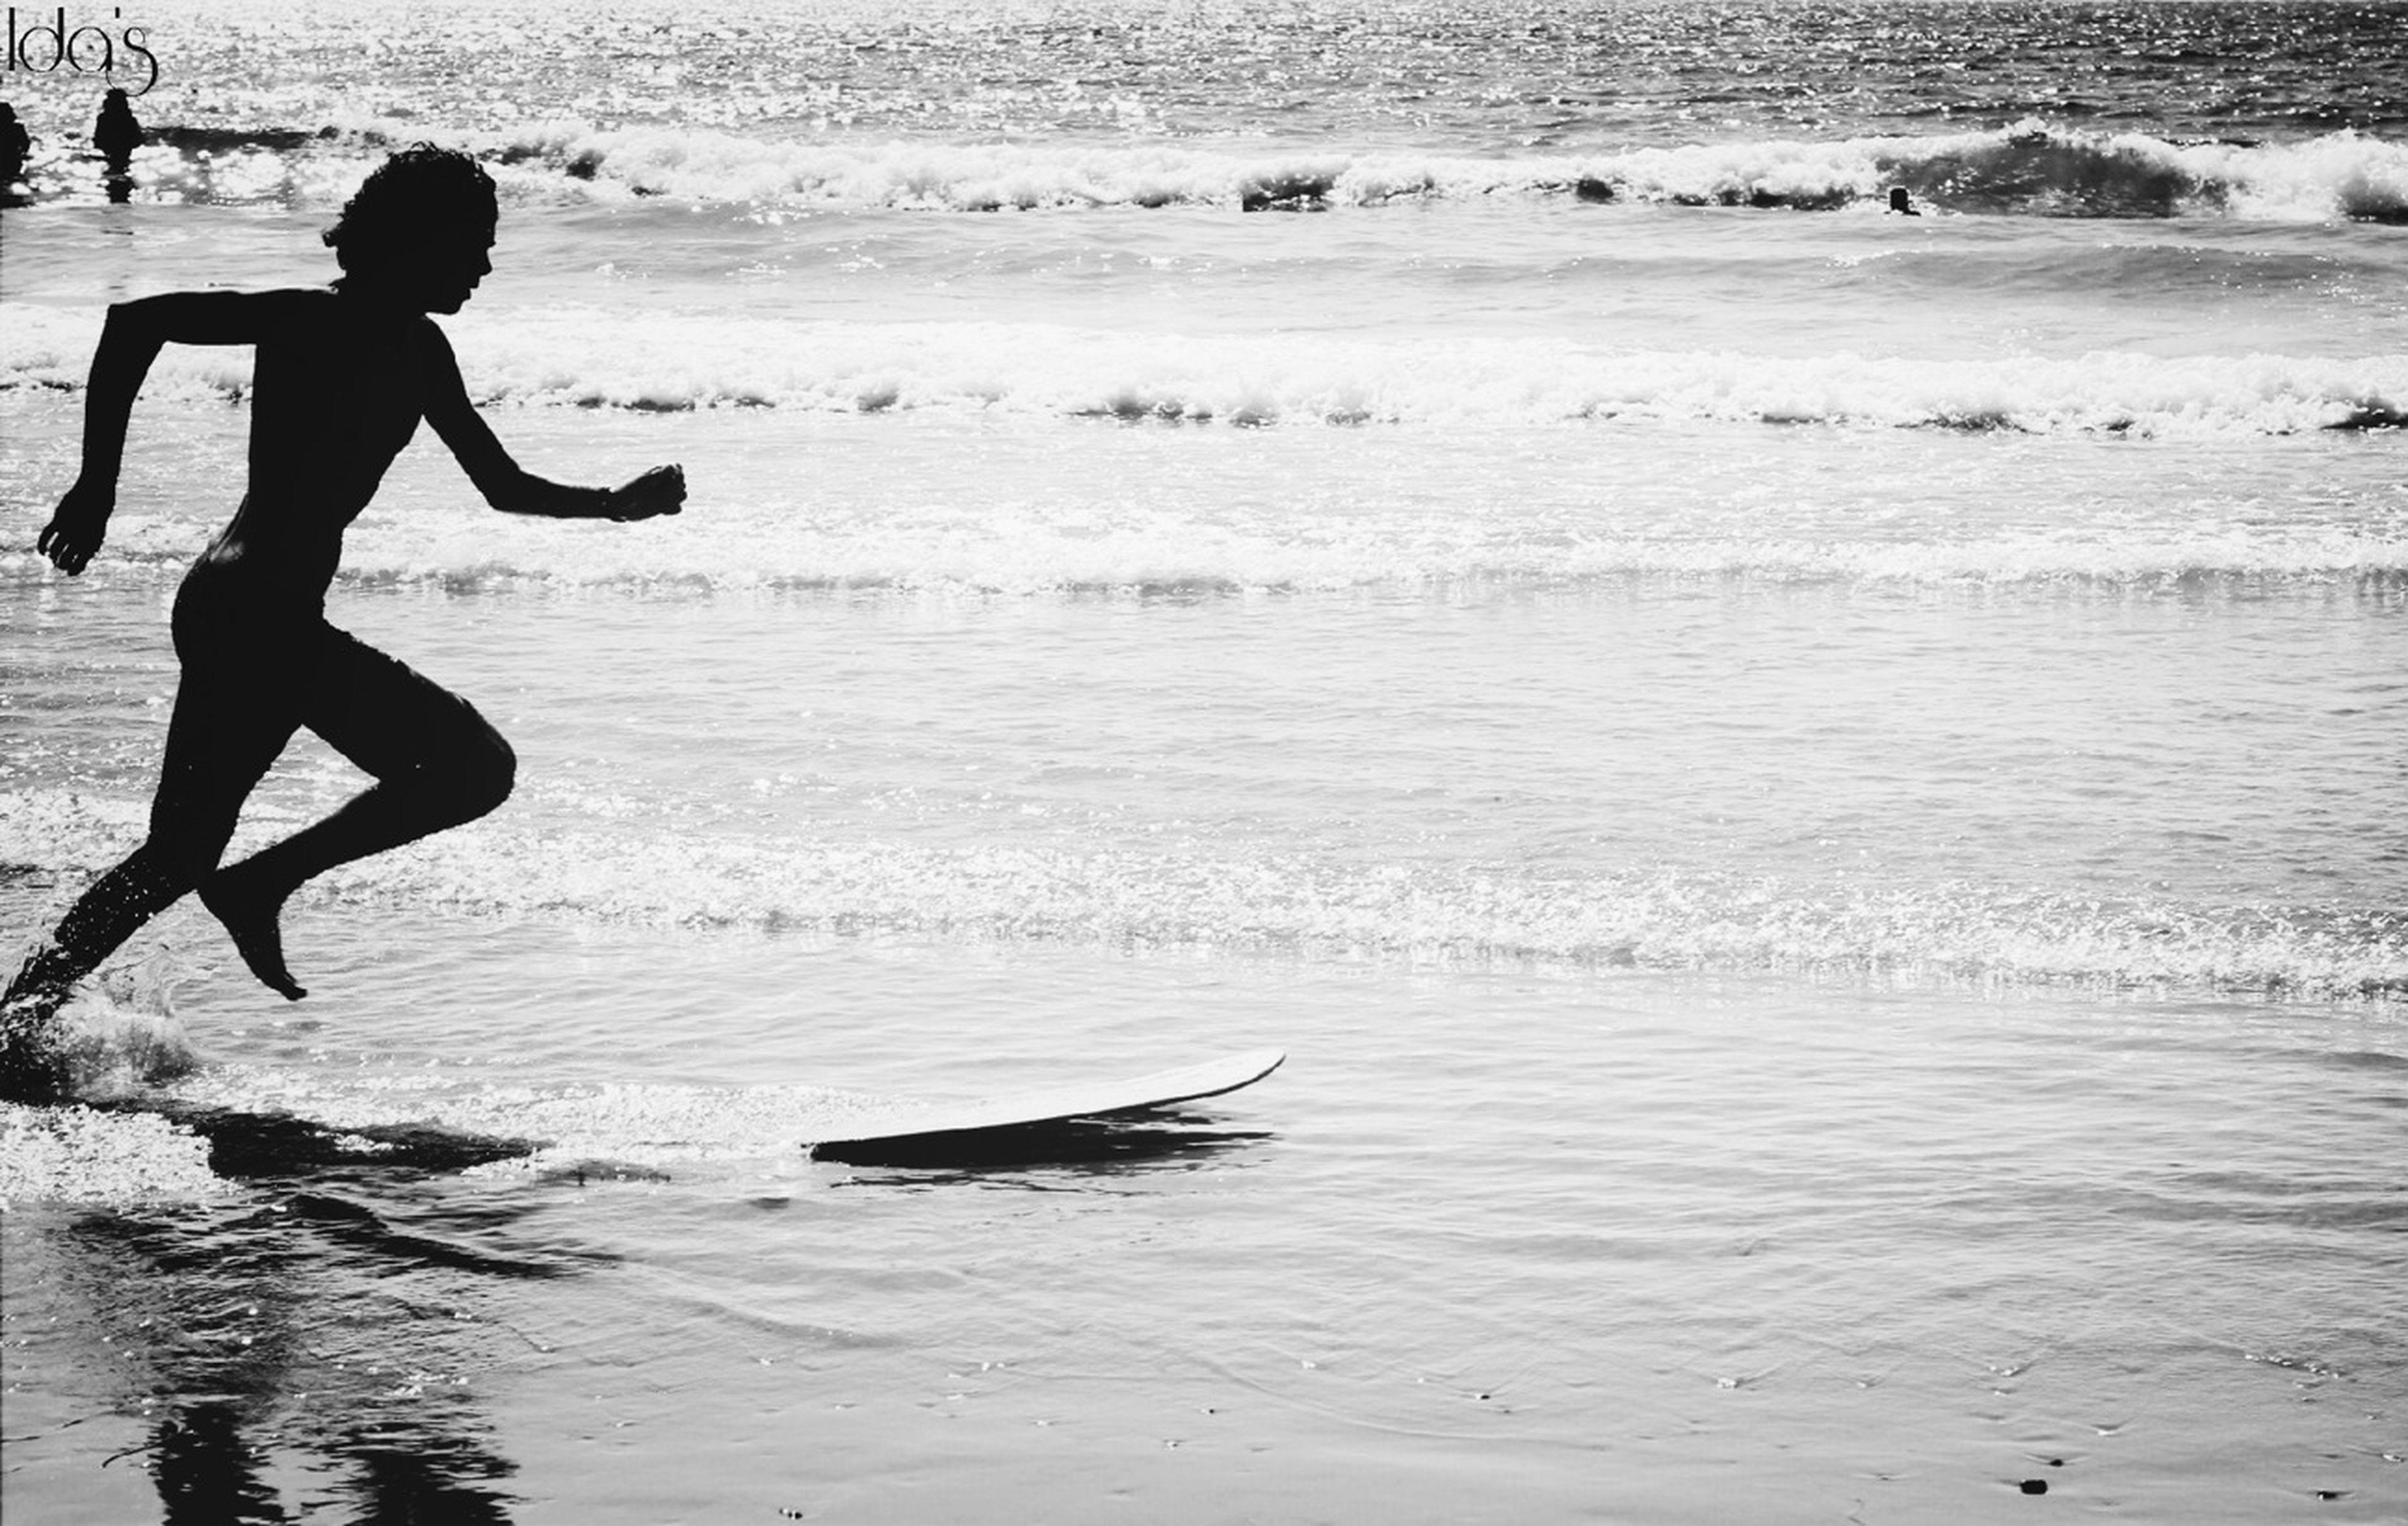 lifestyles, leisure activity, water, full length, men, beach, sea, enjoyment, jumping, vacations, surfboard, wave, childhood, shore, fun, boys, sport